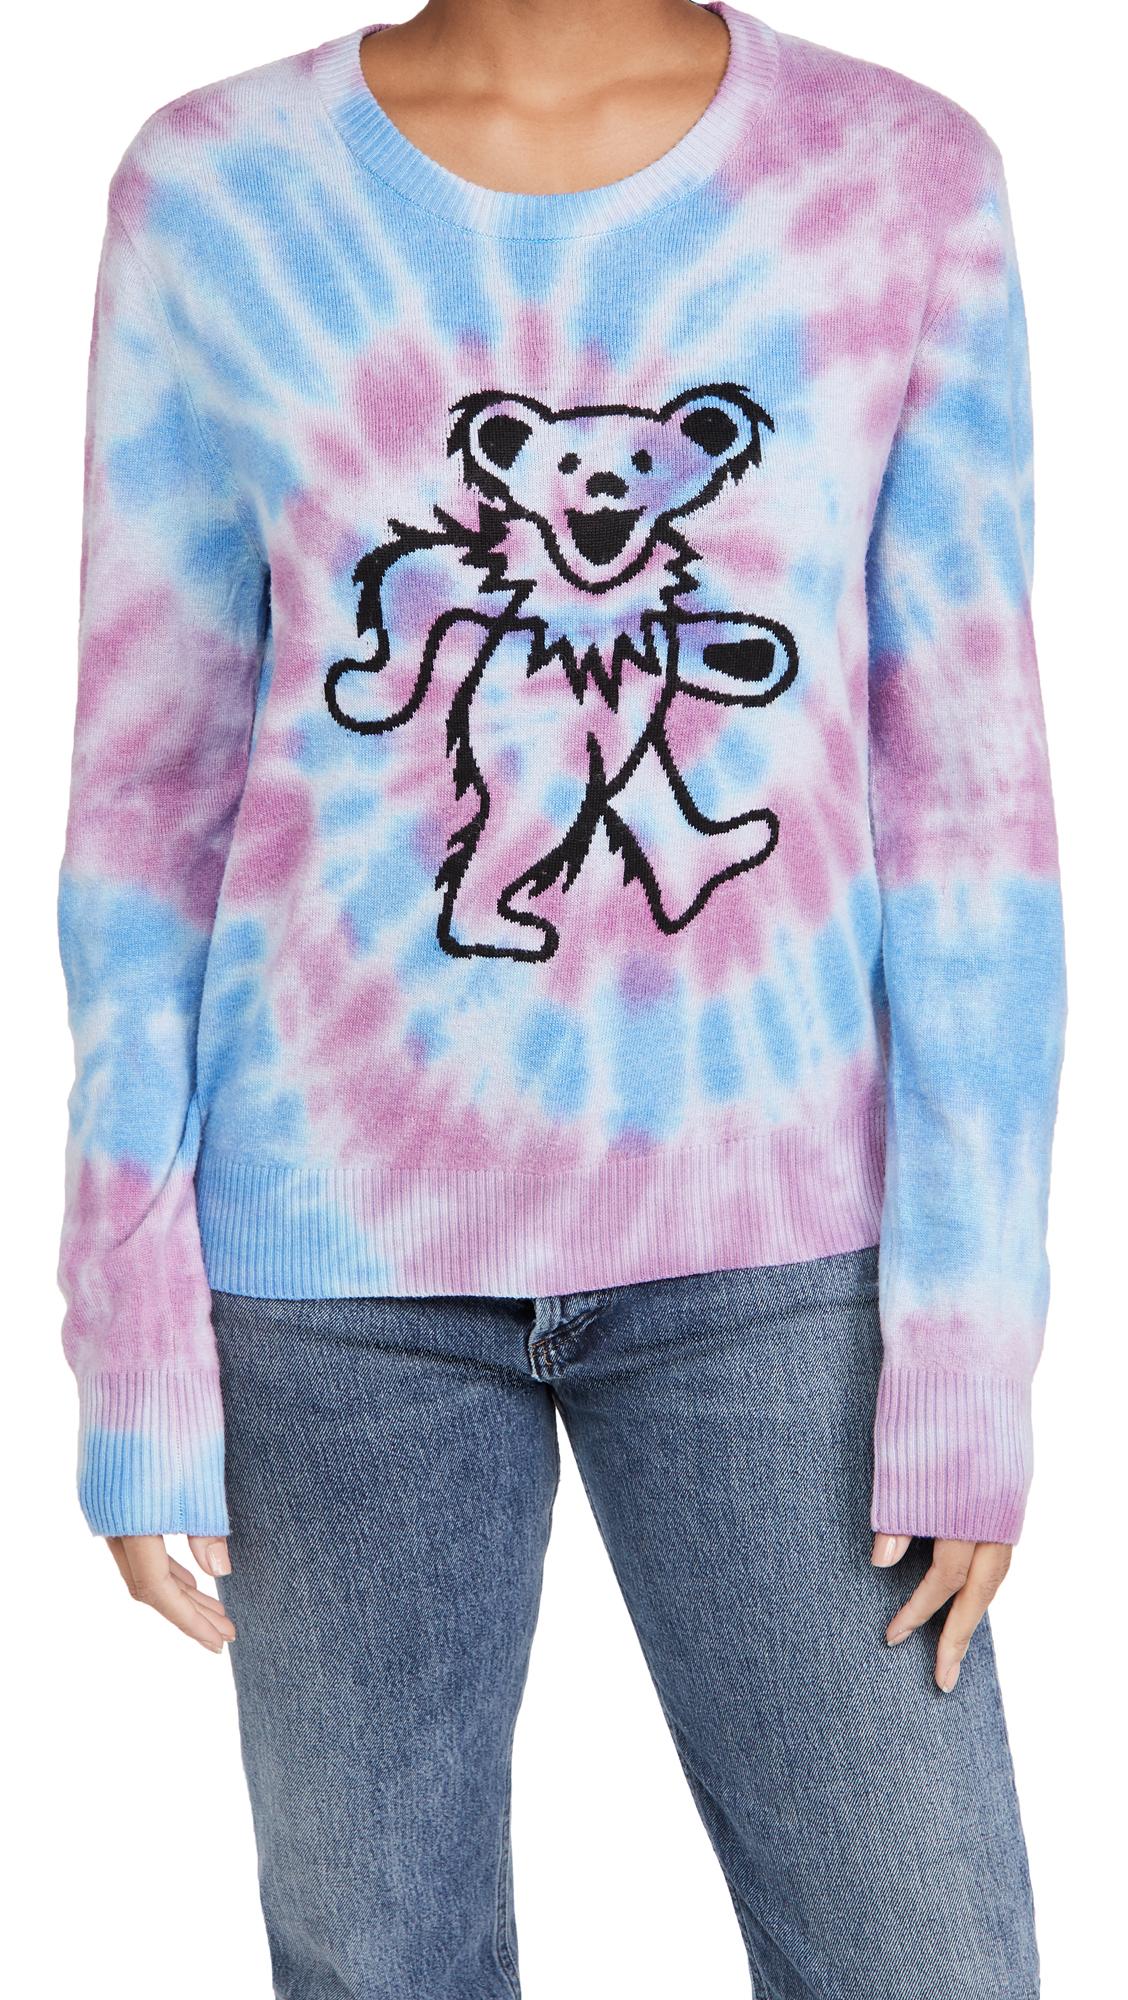 Spiritual Gangster x Grateful Dead Brooklyn Sweater